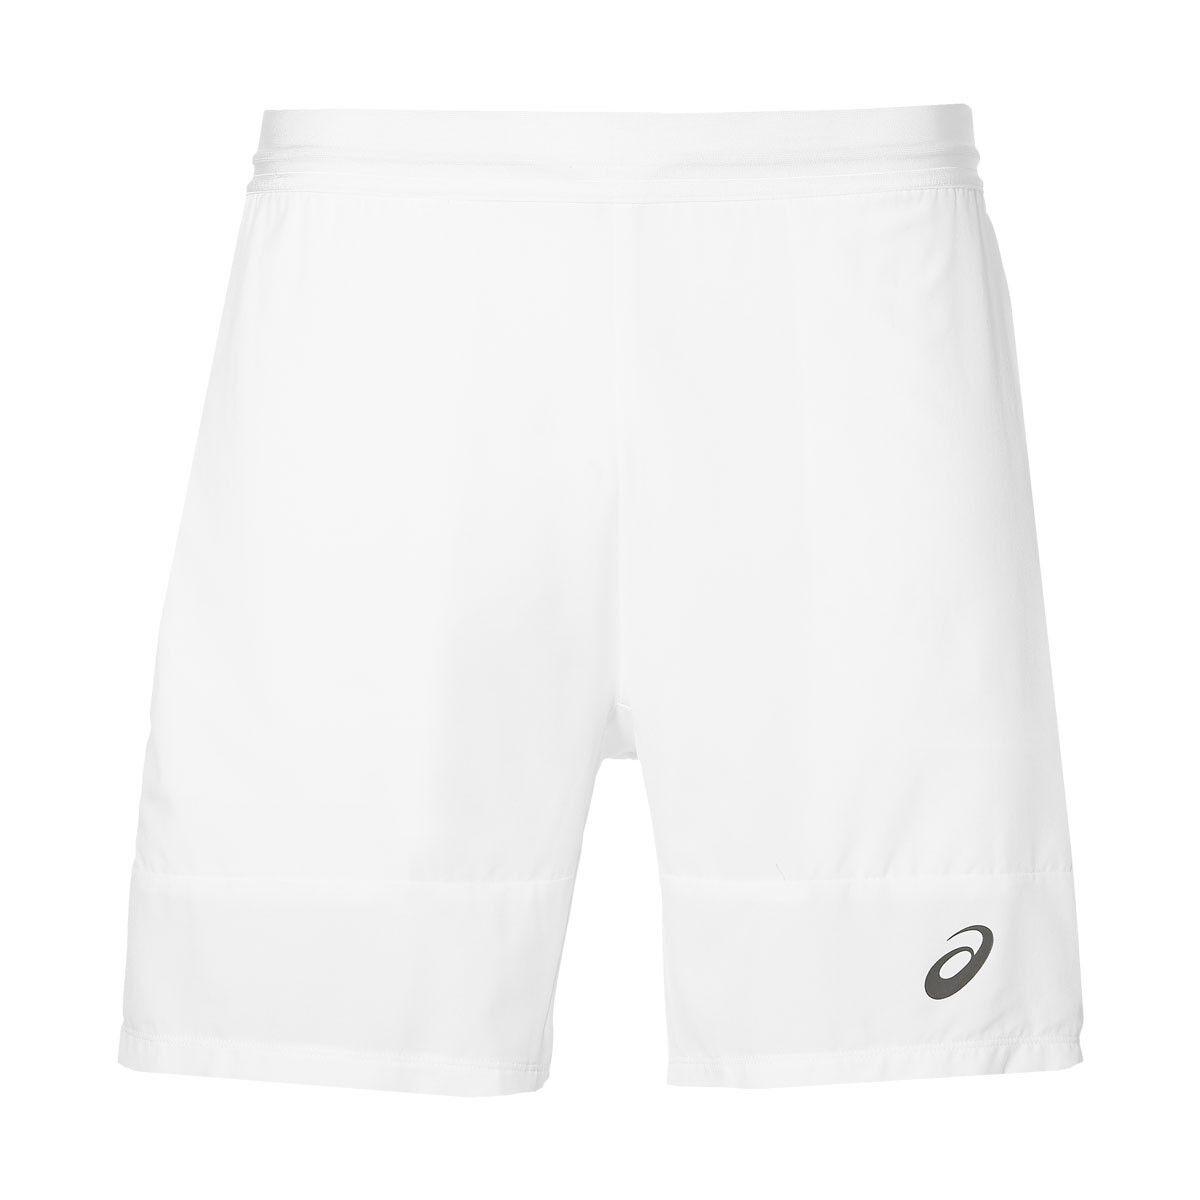 Asics Camisetas  Hombre CORTO M Athlete blancoo  venta de ofertas